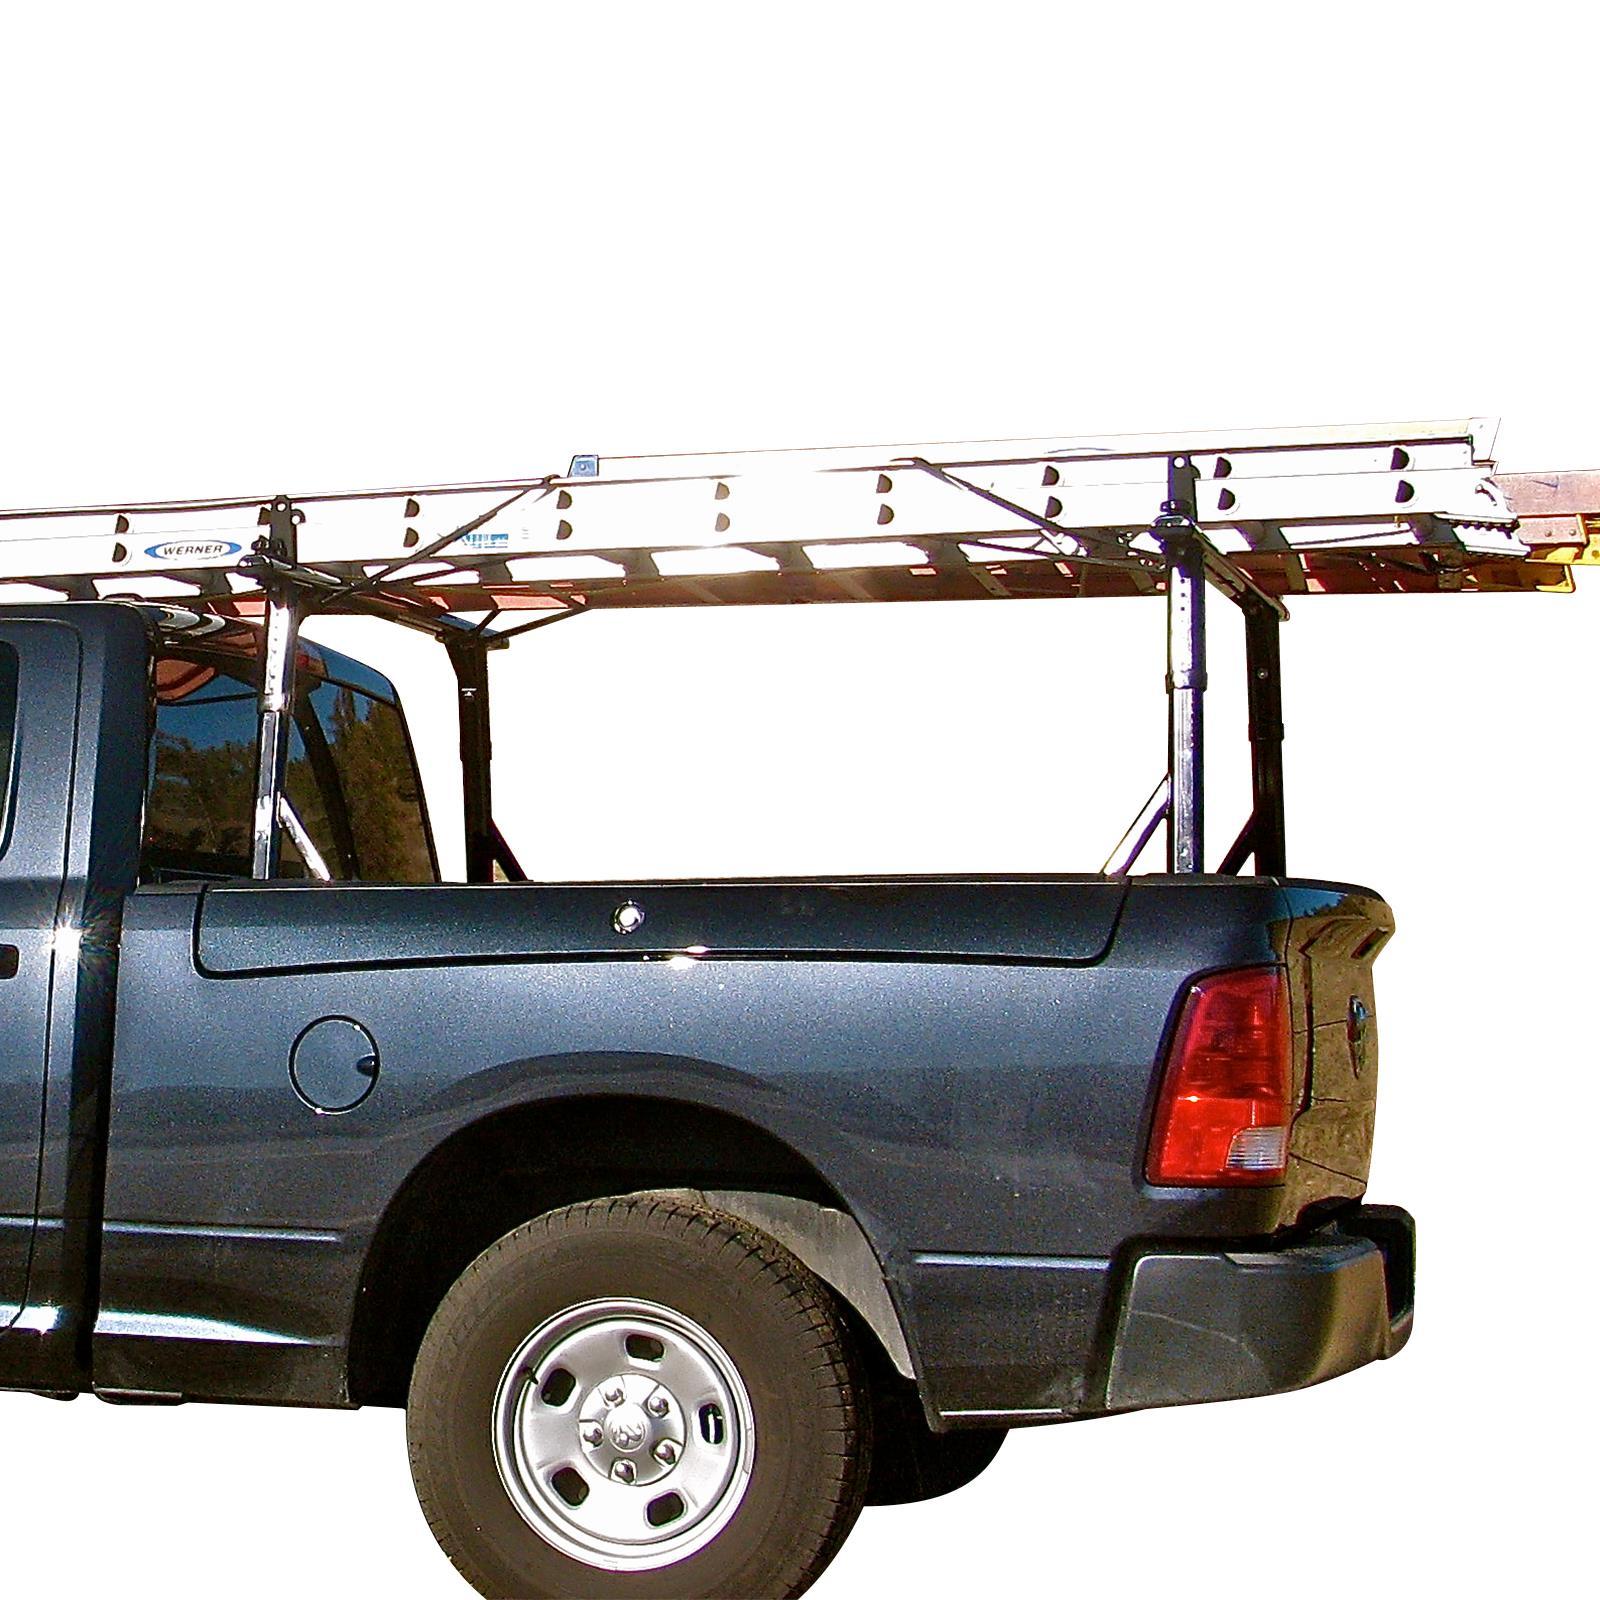 details about vantech p3000 aluminum ladder rack system fits ram rambox pickup truck black